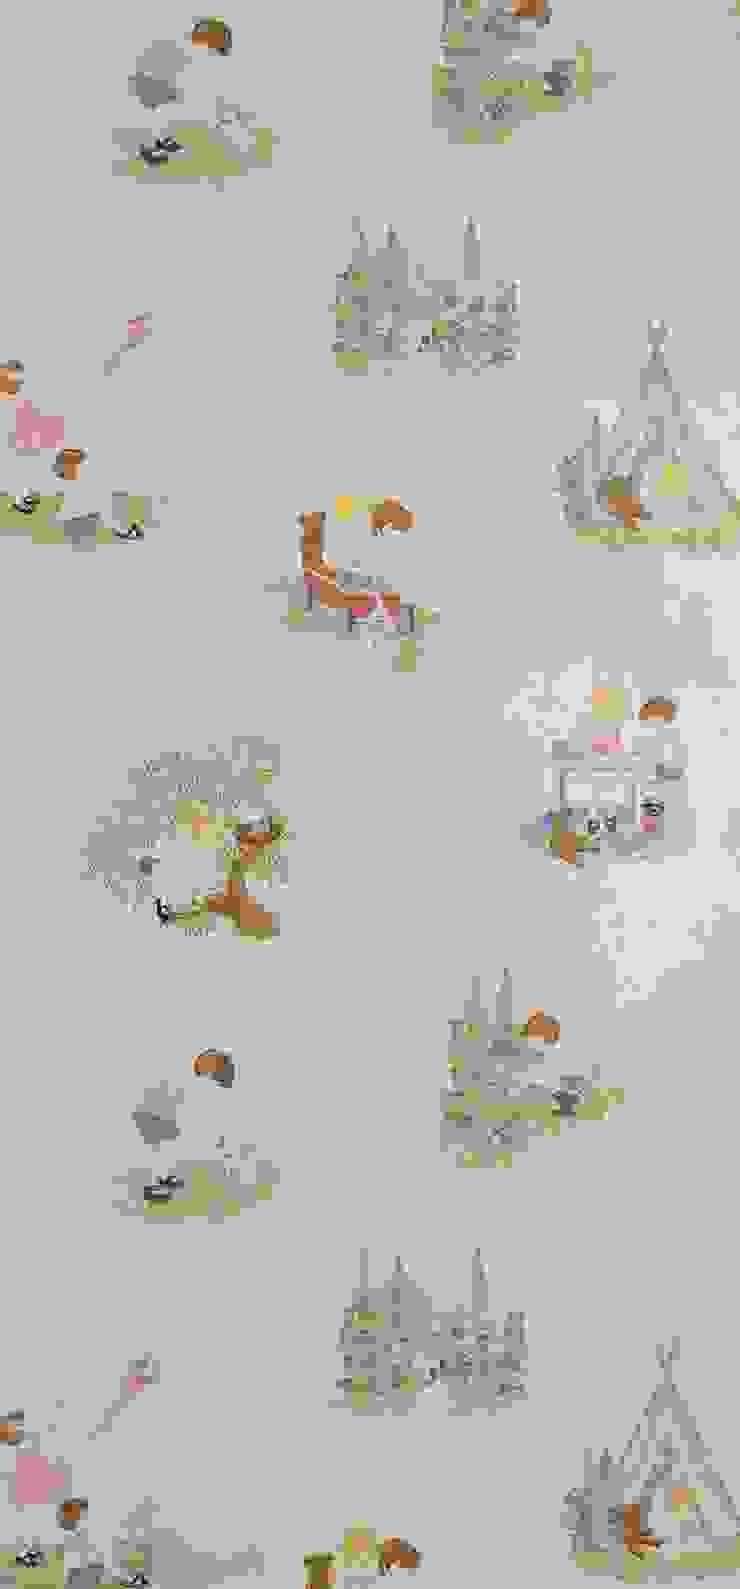 PLAYTIME Wallpaper 10m Ropll de Hevensent Clásico